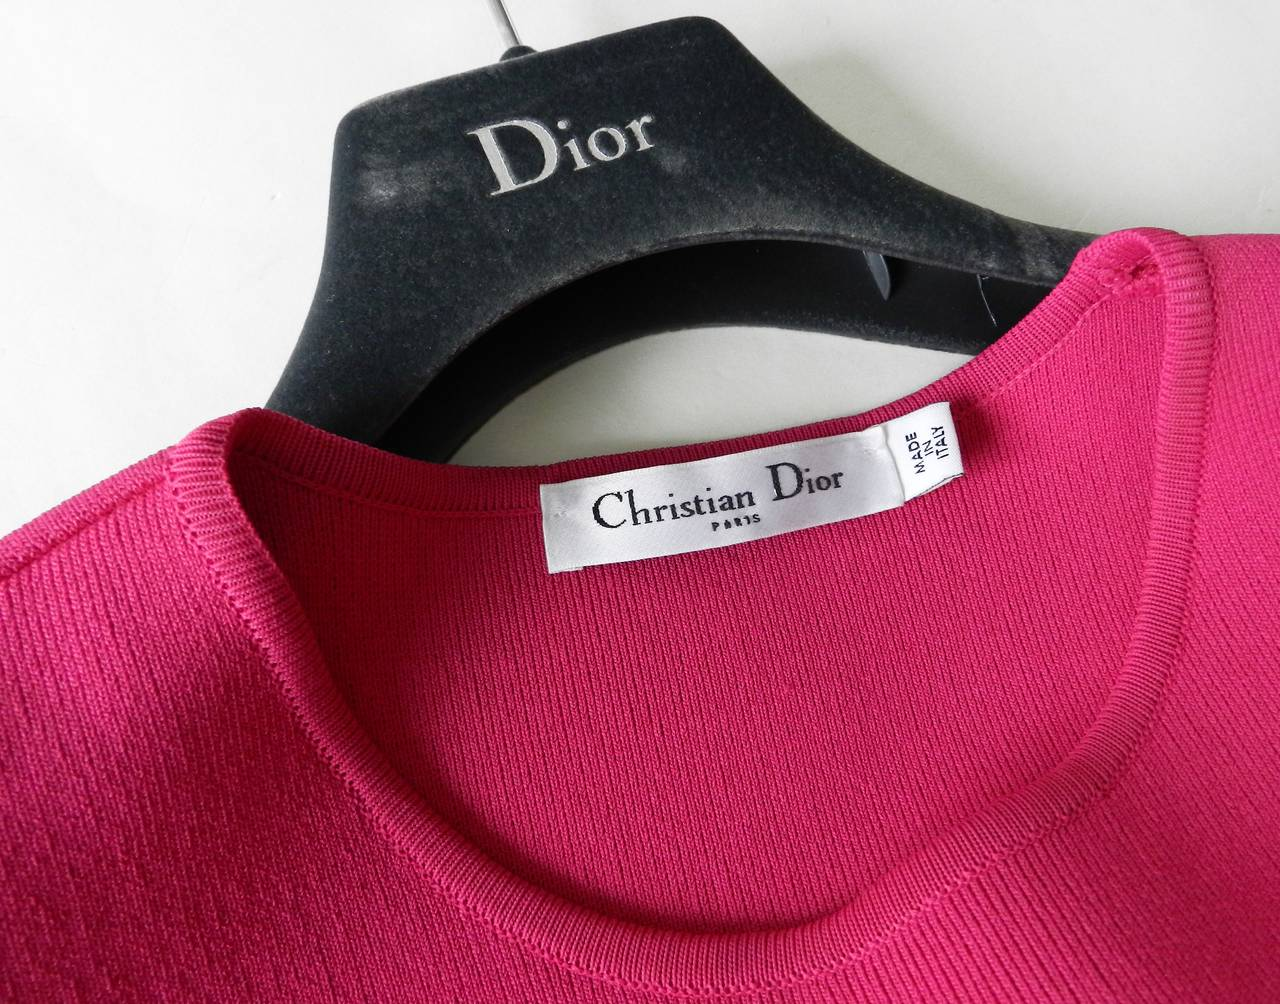 Christian Dior Galliano Hot Fuchsia Jersey Dress 4